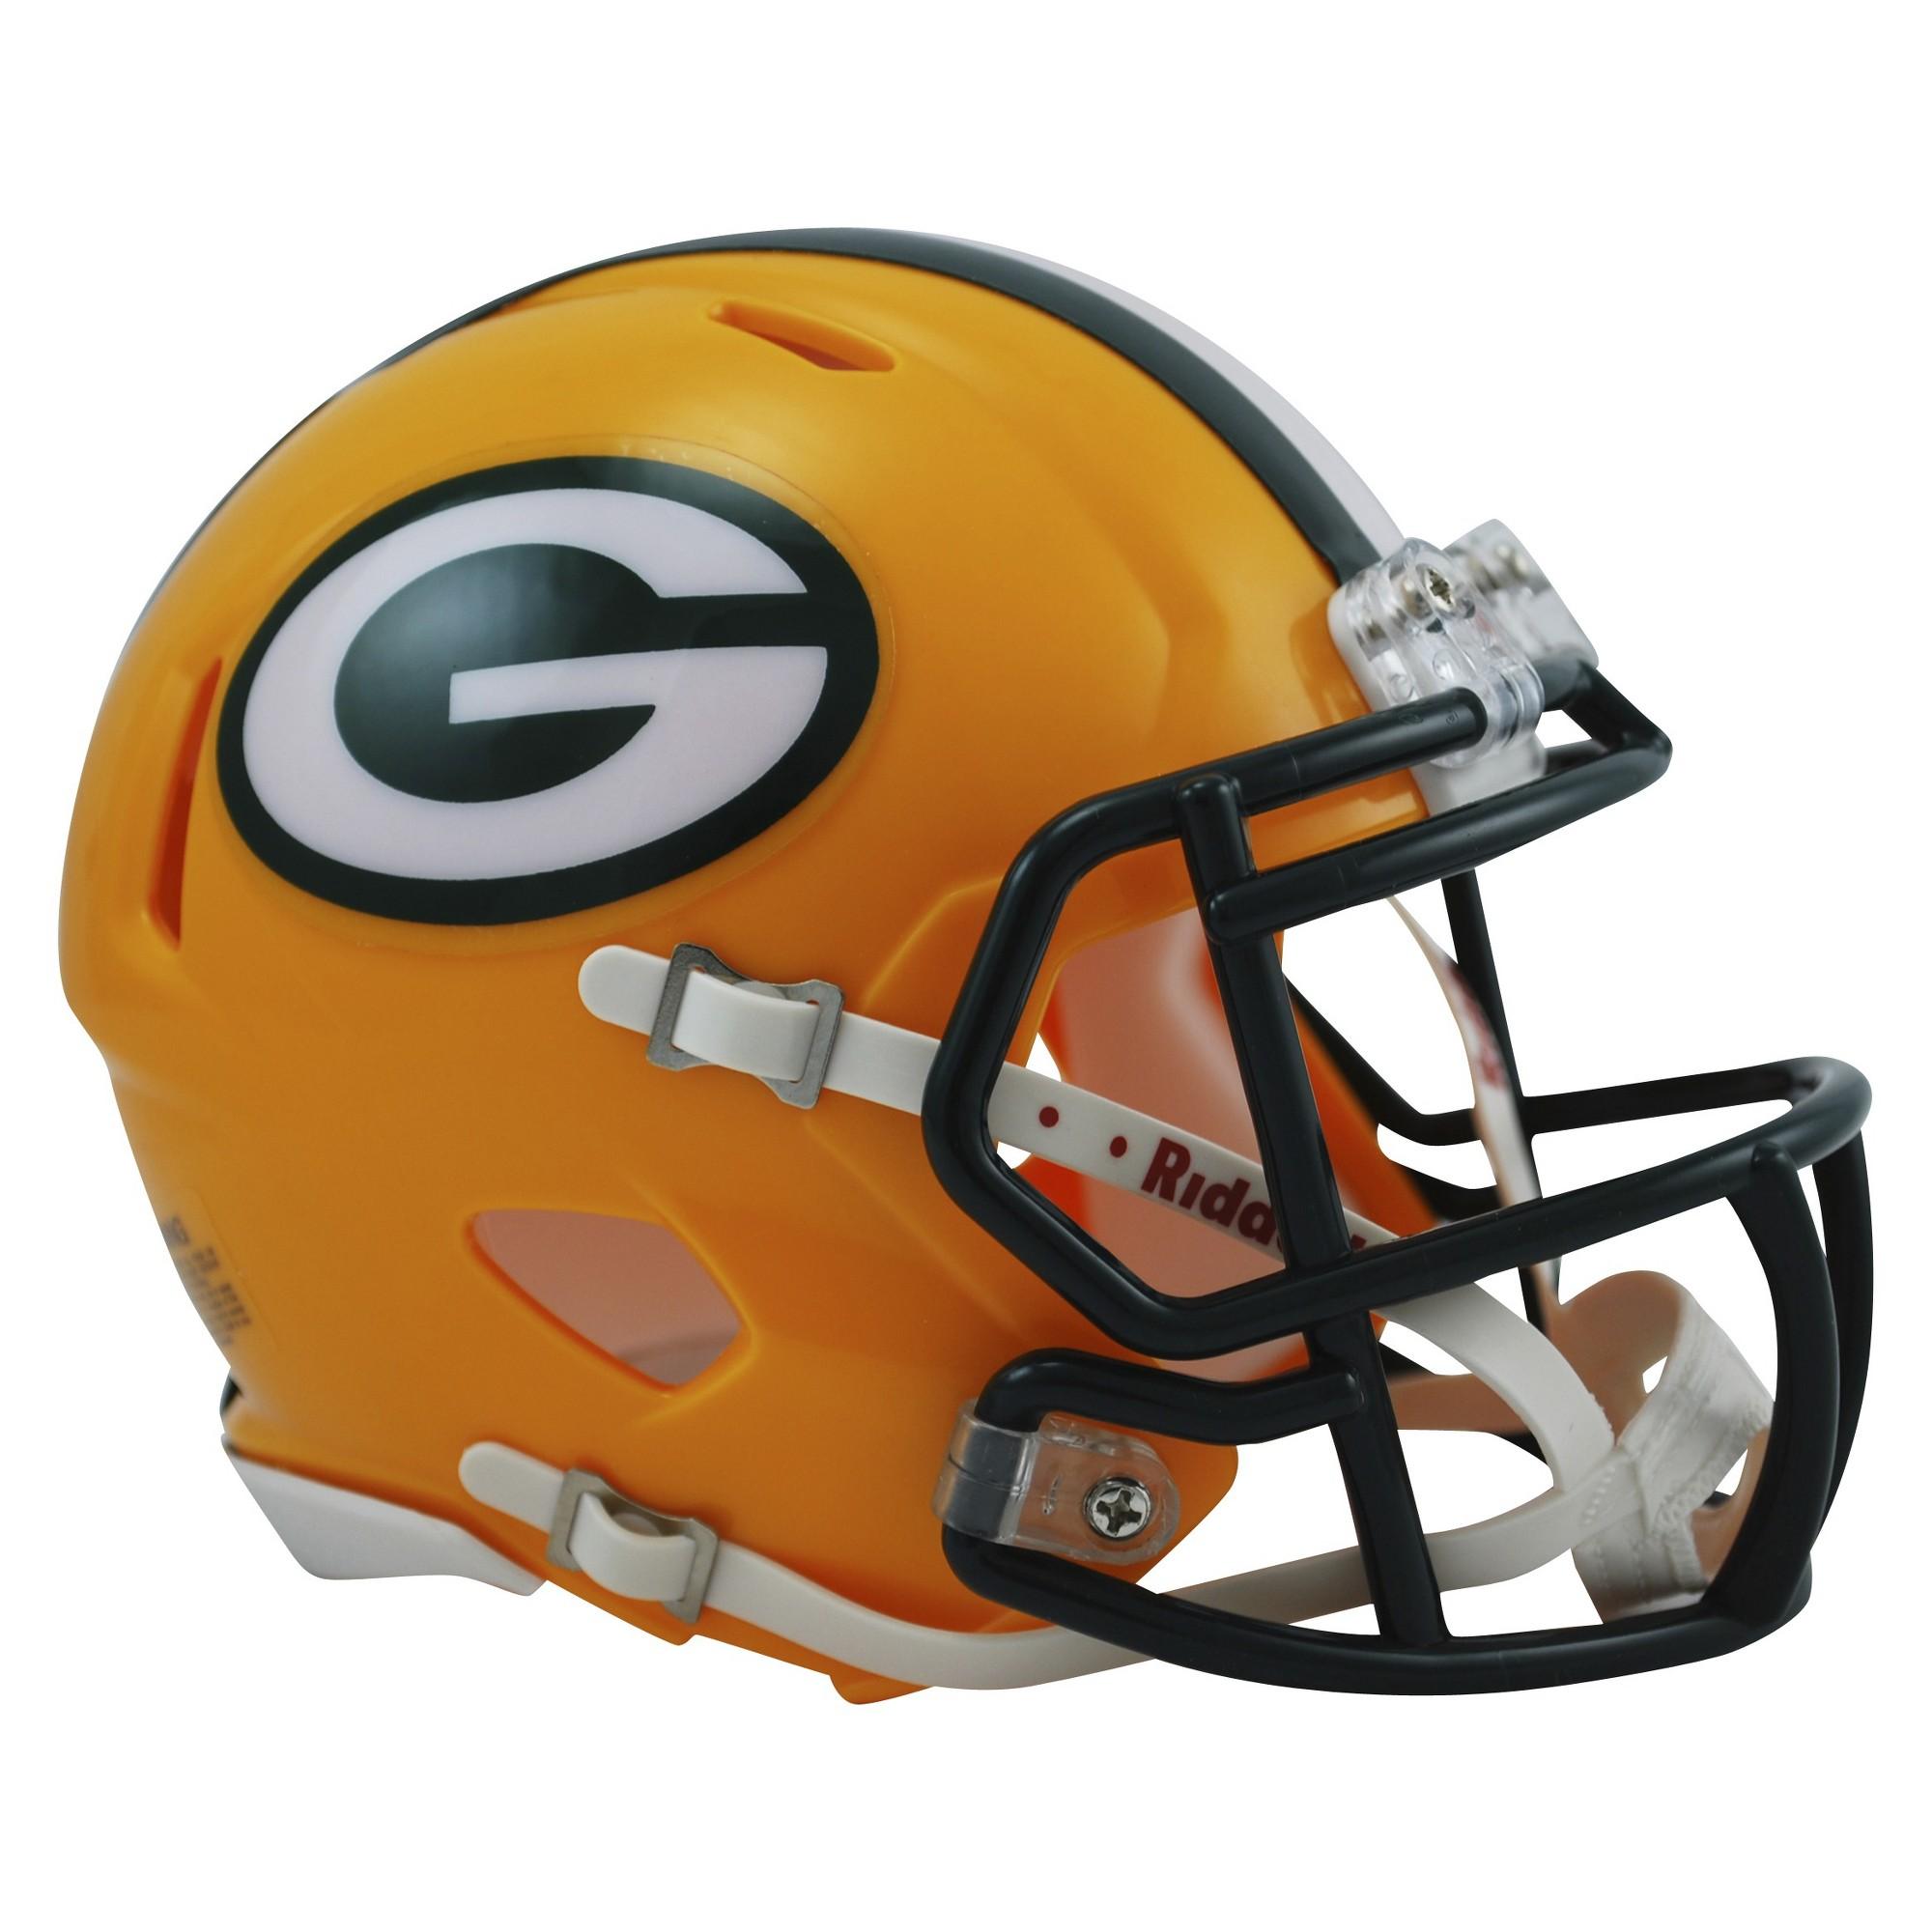 Green Bay Packers Riddell Speed Mini Helmet Gold Mini Football Helmet Football Helmets Mini Footballs